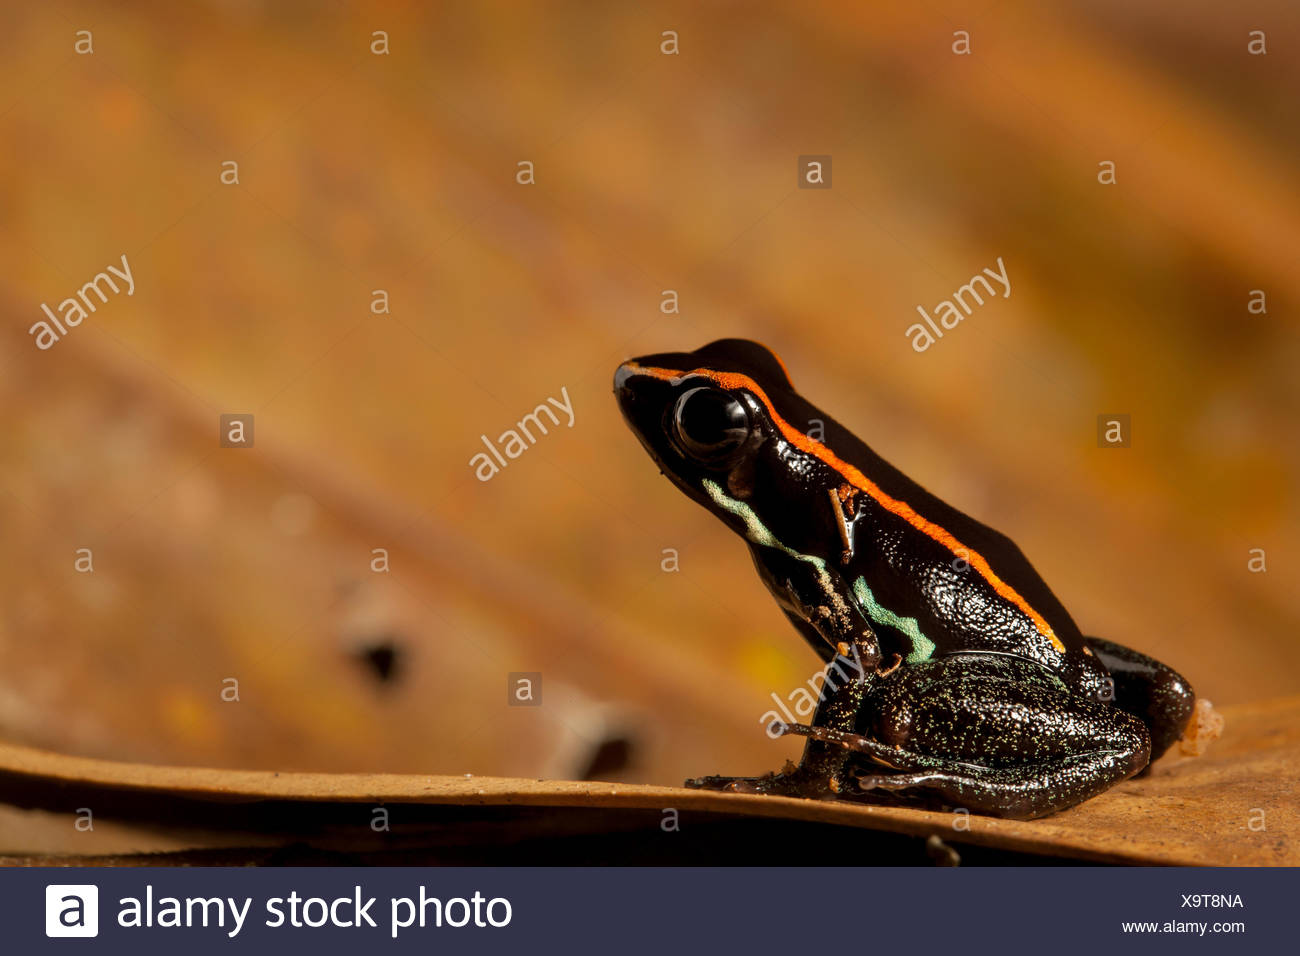 Portrait of a golfo dulce poison dart frog, Phyllobates vittatus. - Stock Image